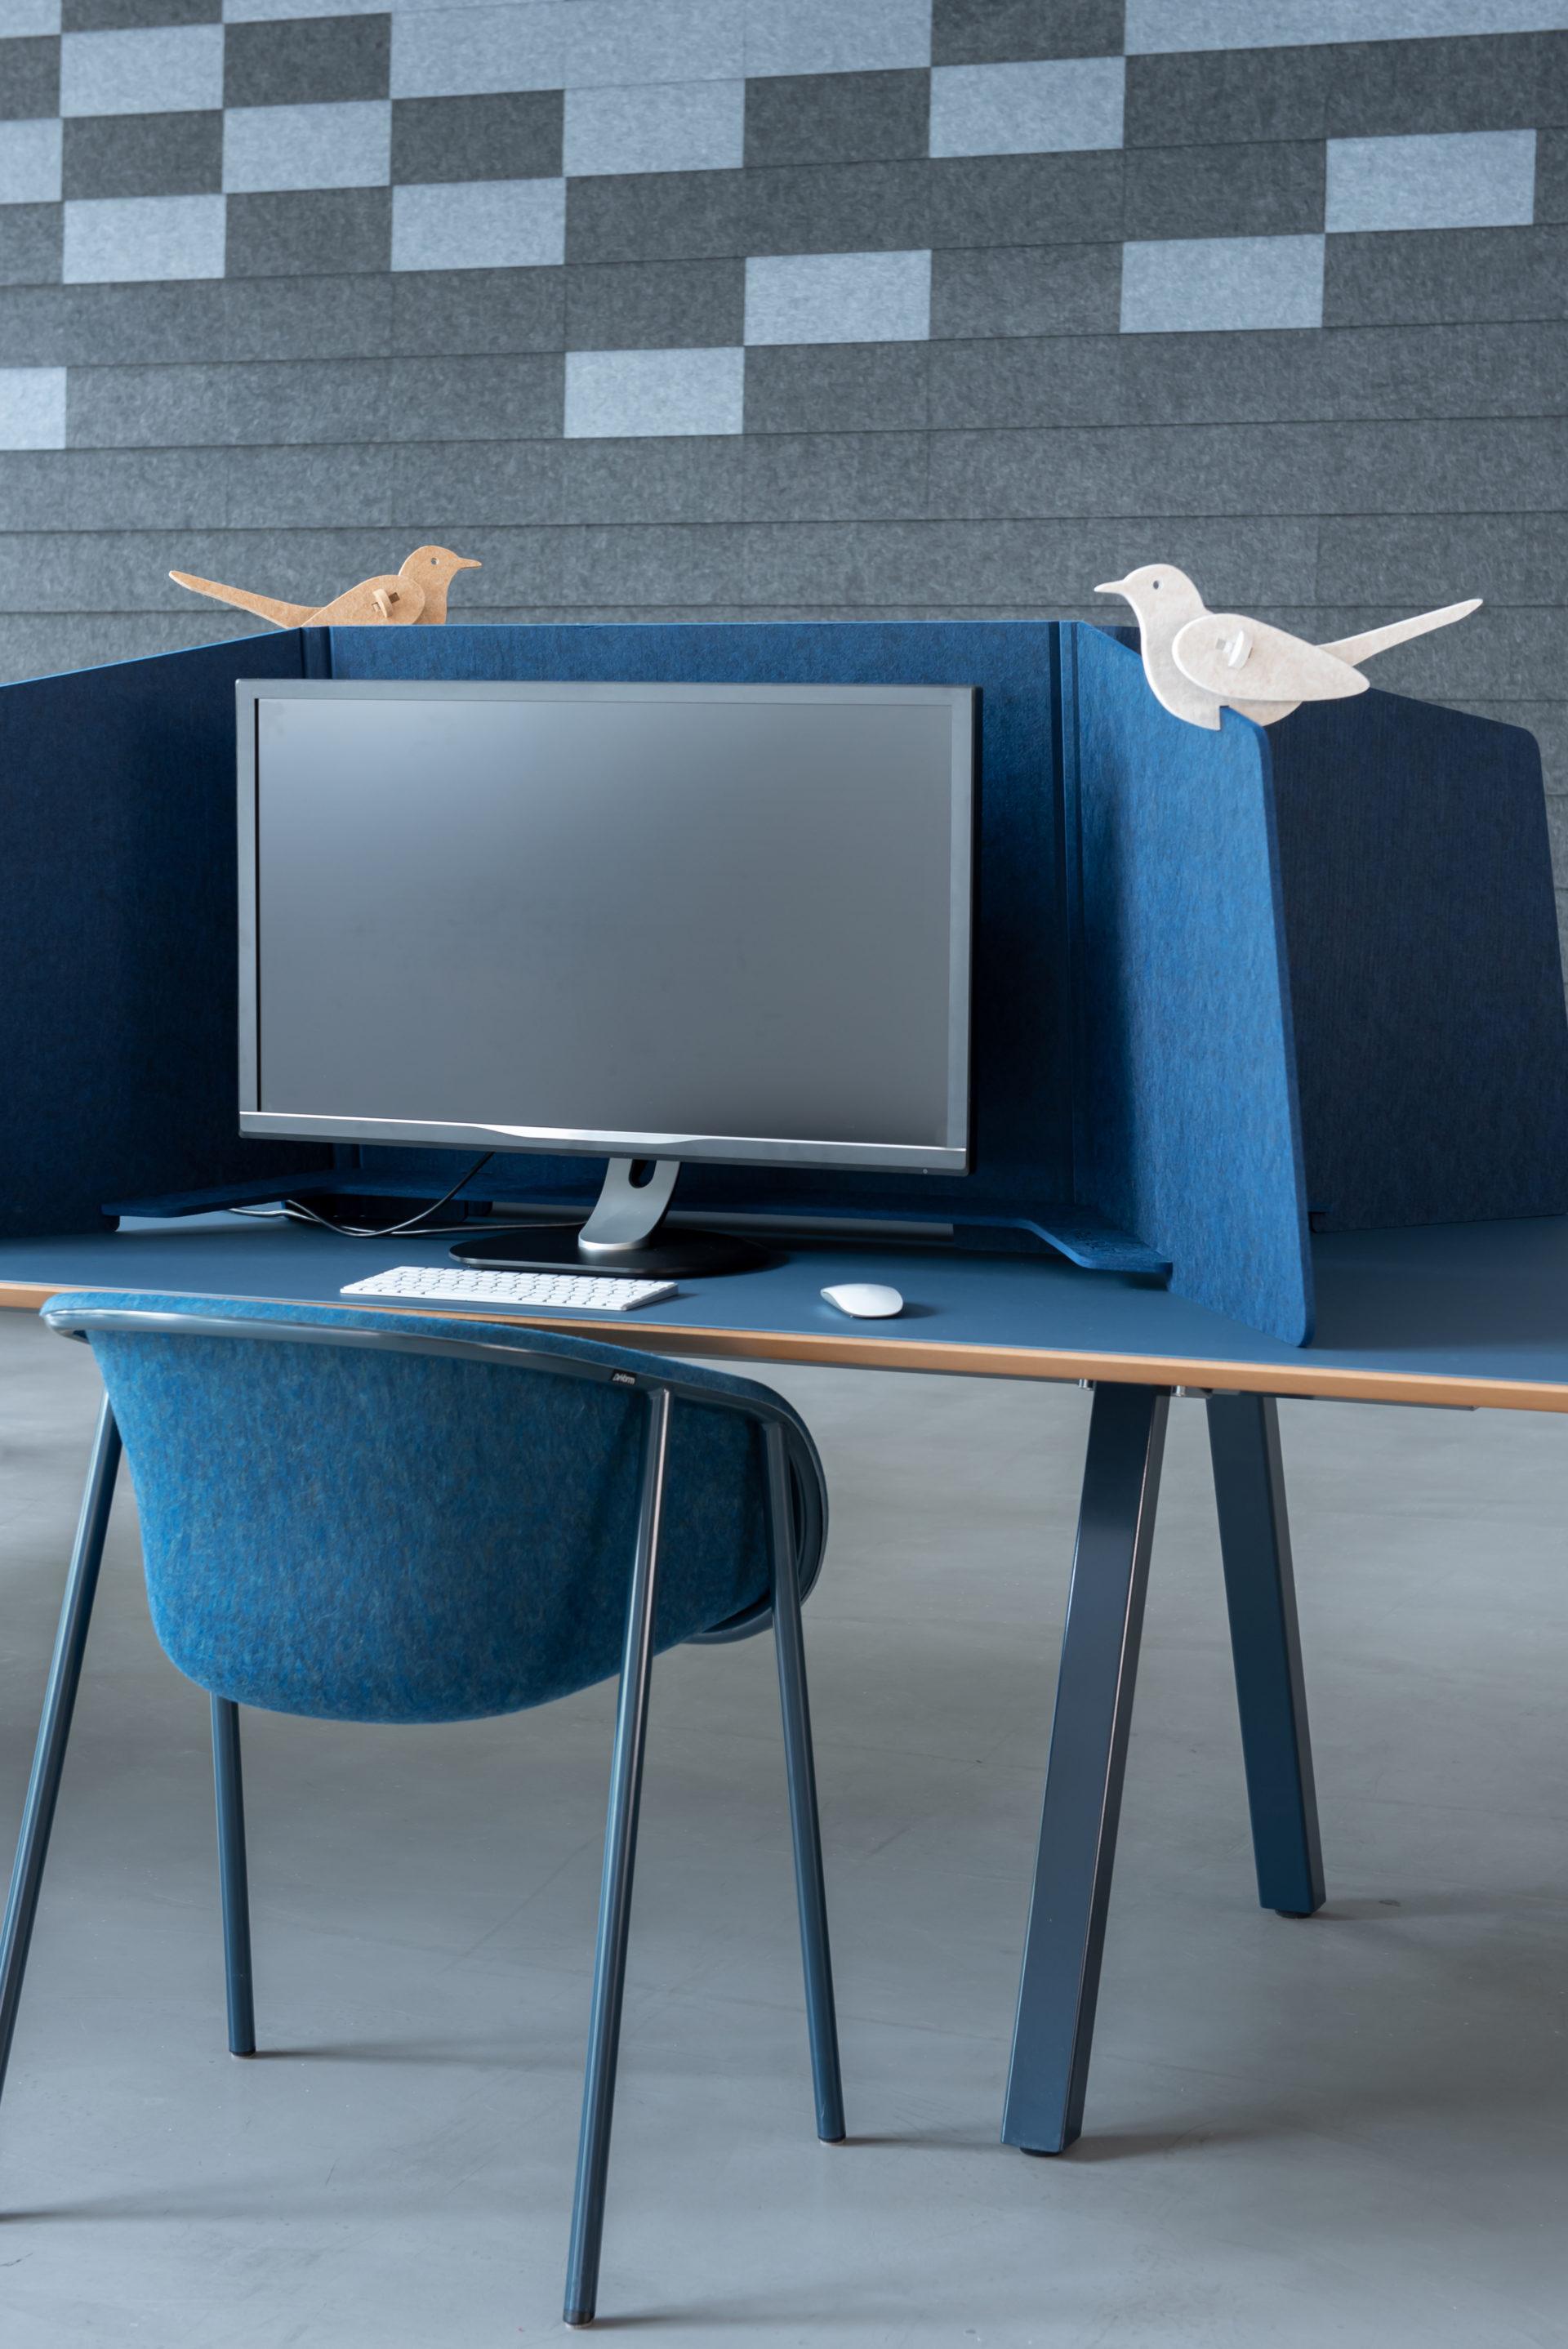 ReFelt PET Felt Workplace Divider 1.5m blue 2